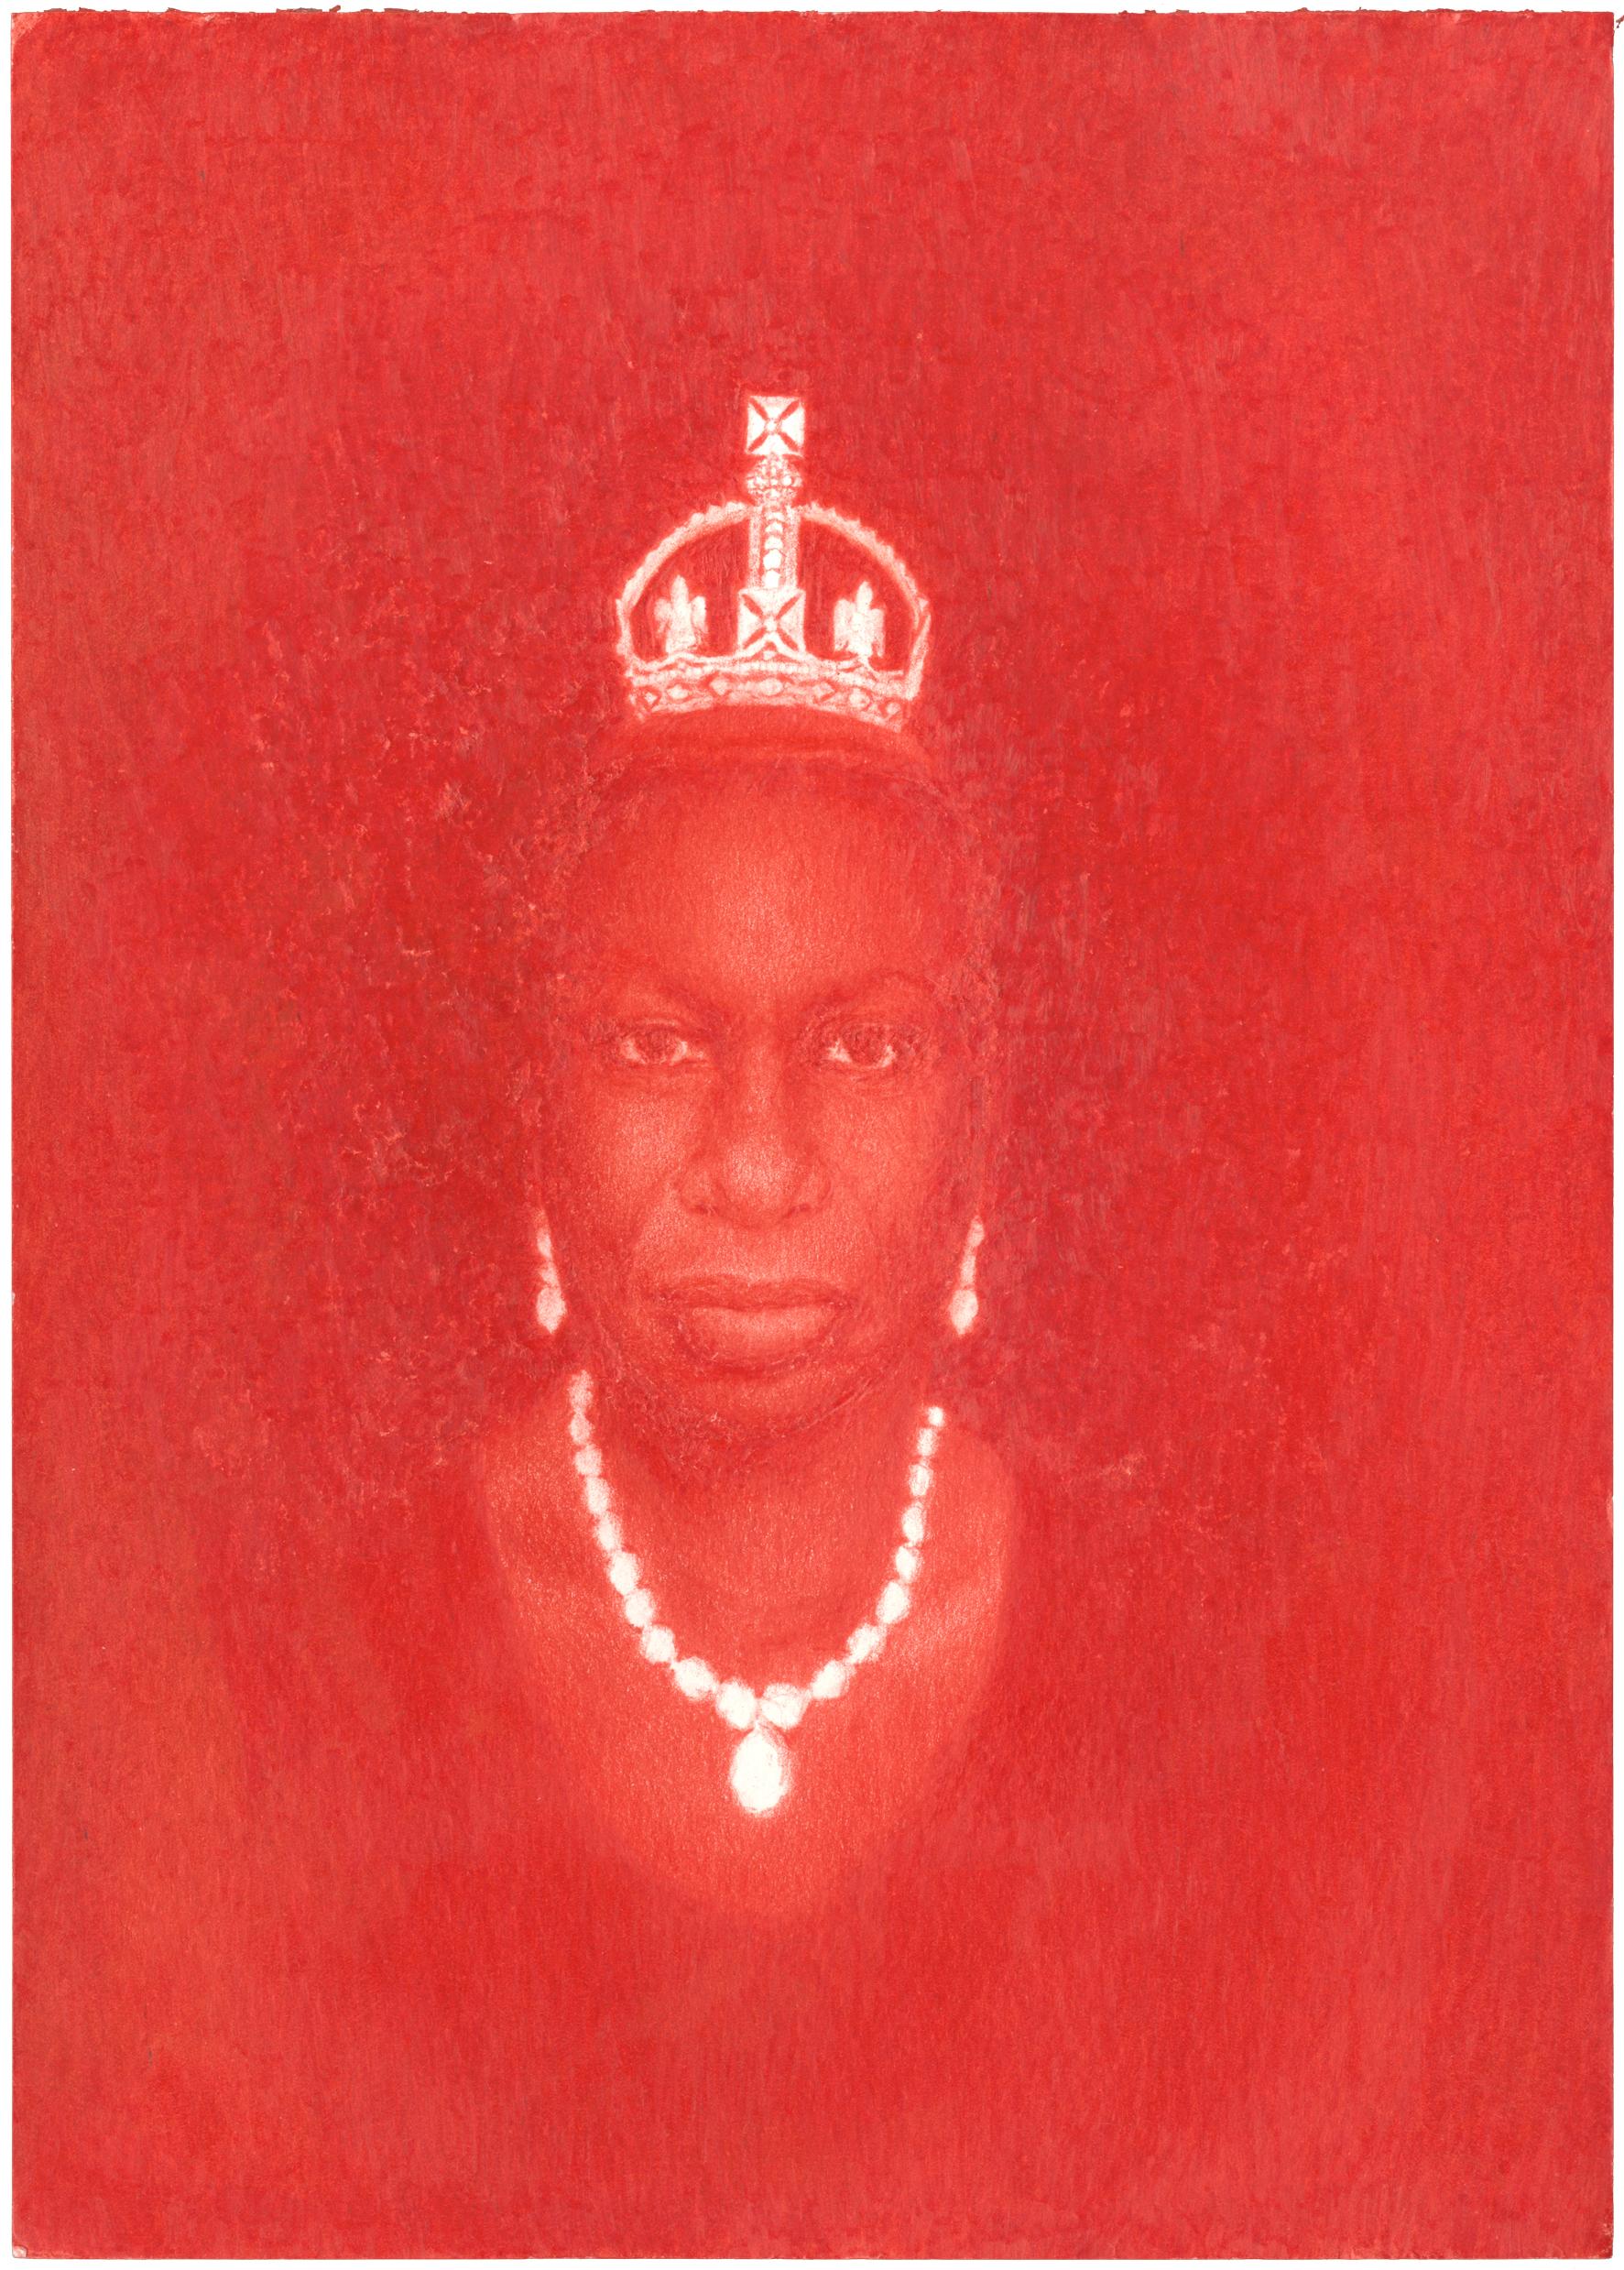 Pedro A.H. Paixão, Petite Couronne de Diamant (Nina Simone in memoriam), 2015, crayons de couleur sur papier, 20,9 x 14,8 cm, courtesy galeria 111